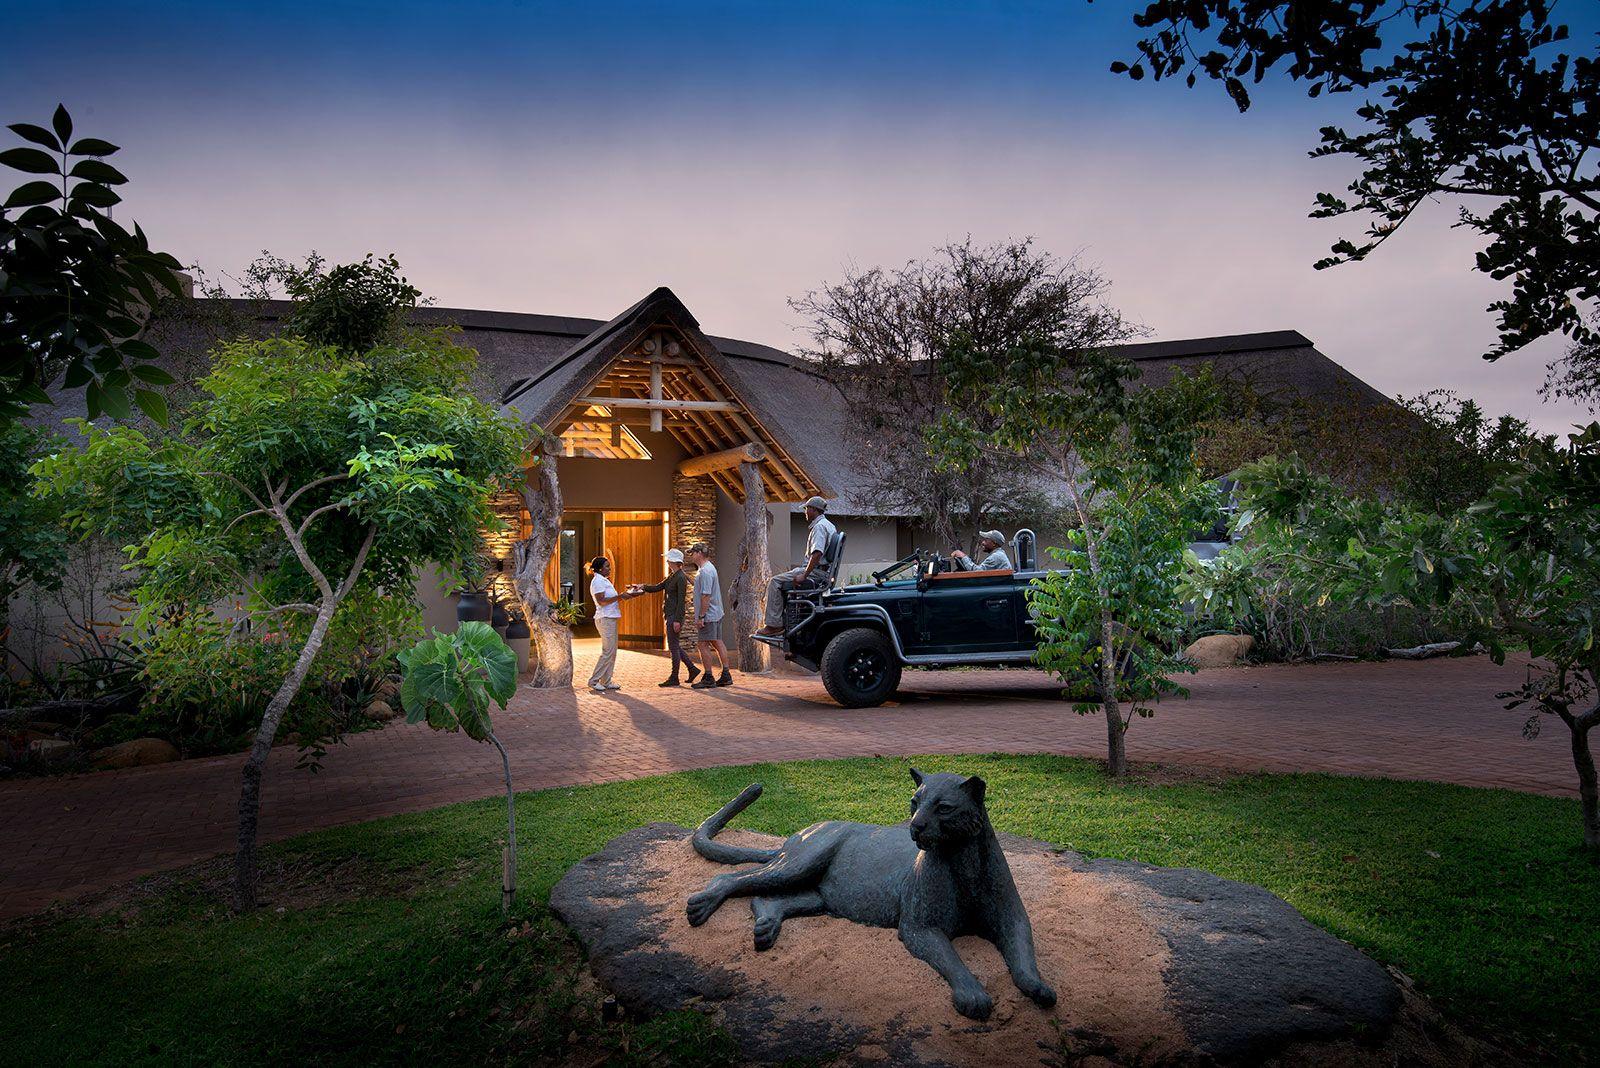 RockFig Safari Lodge